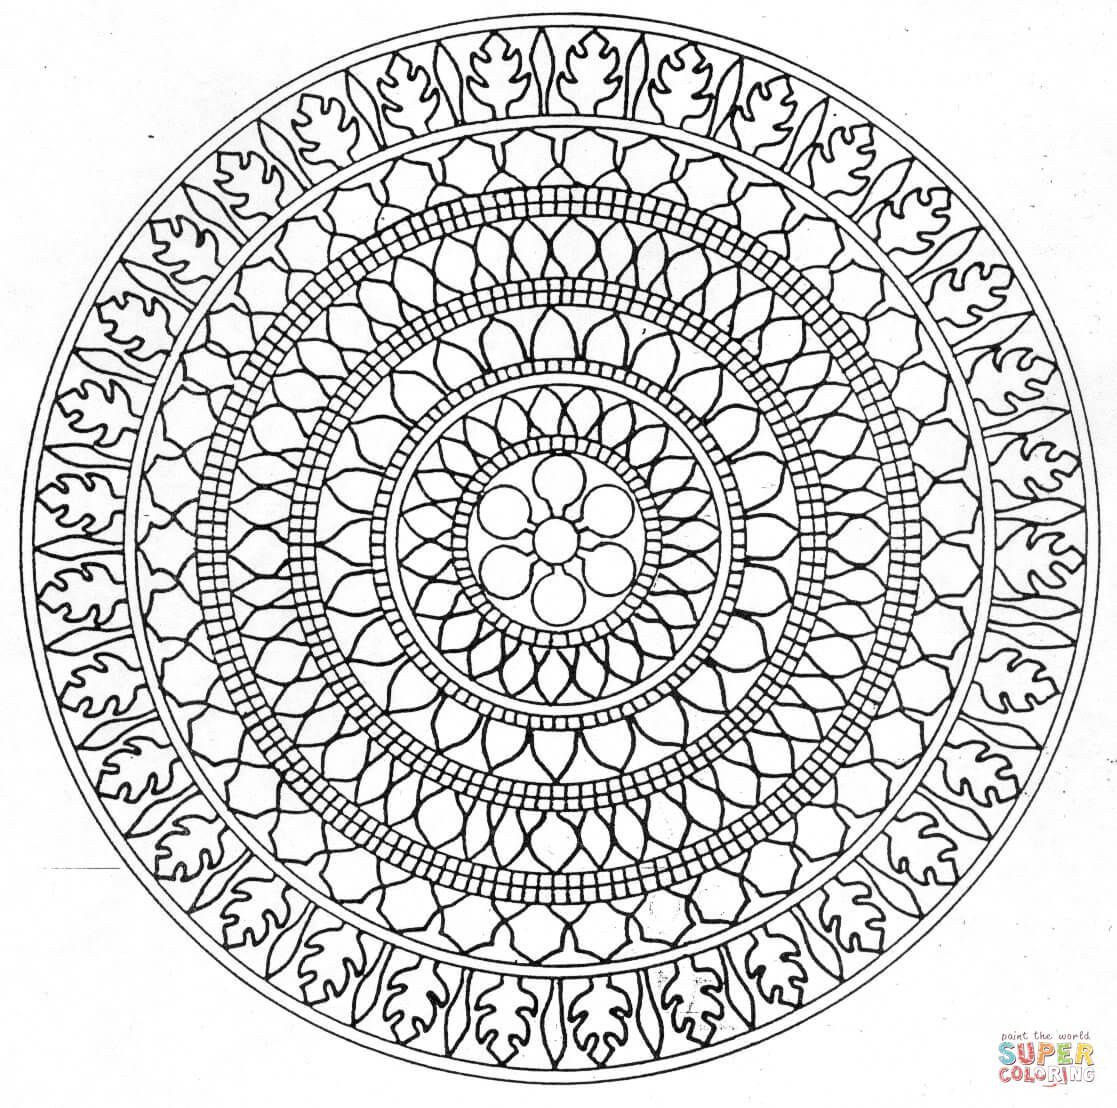 29 Printable Mandala Abstract Colouring Pages For Meditation